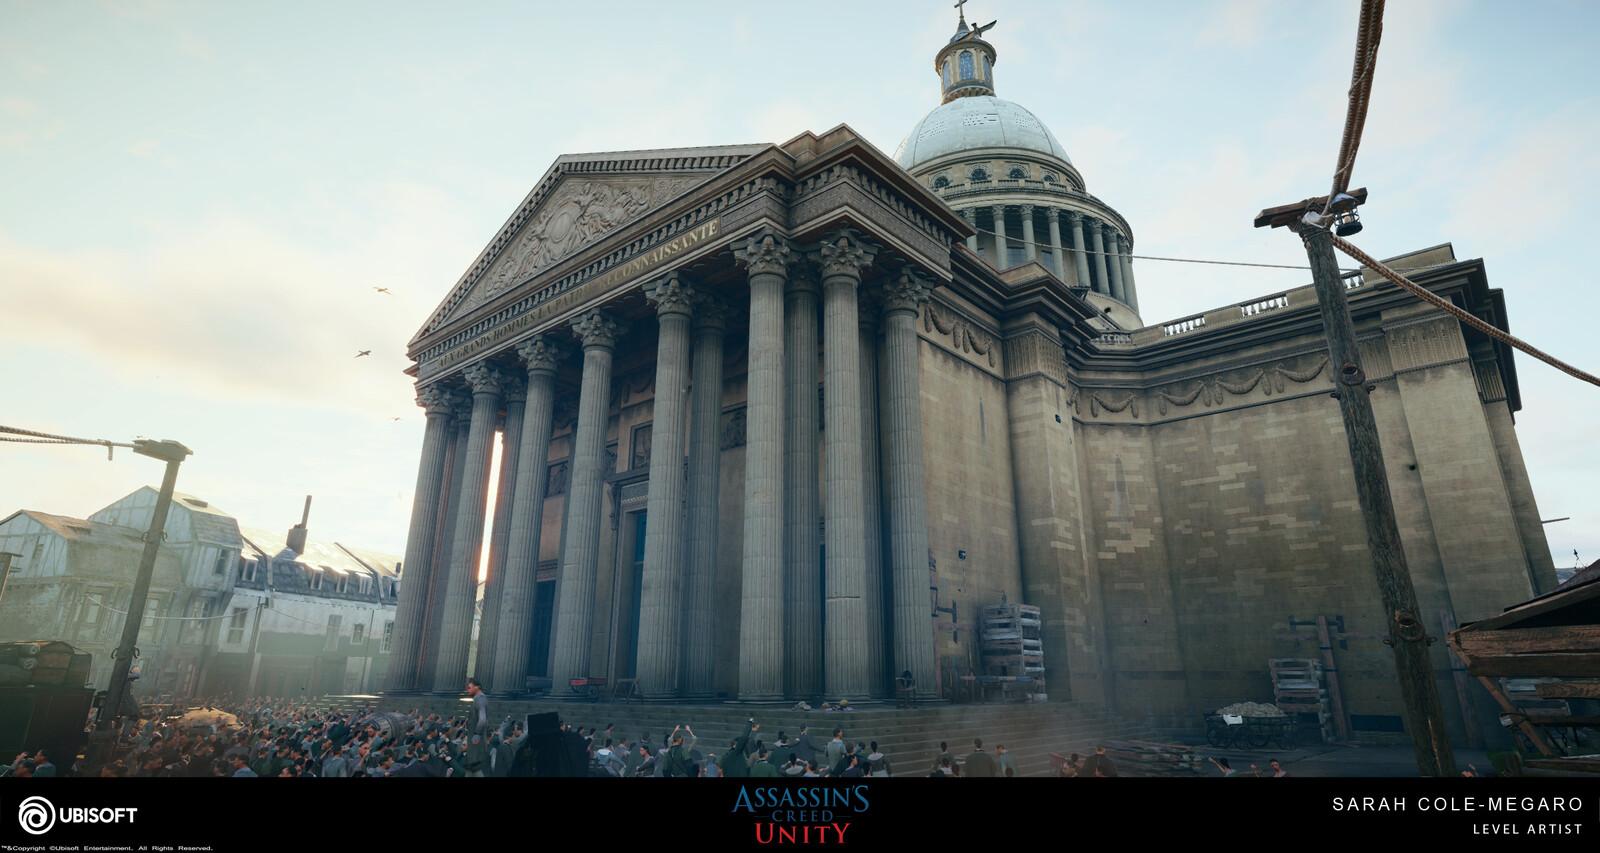 Assassins Creed Unity: Pantheon